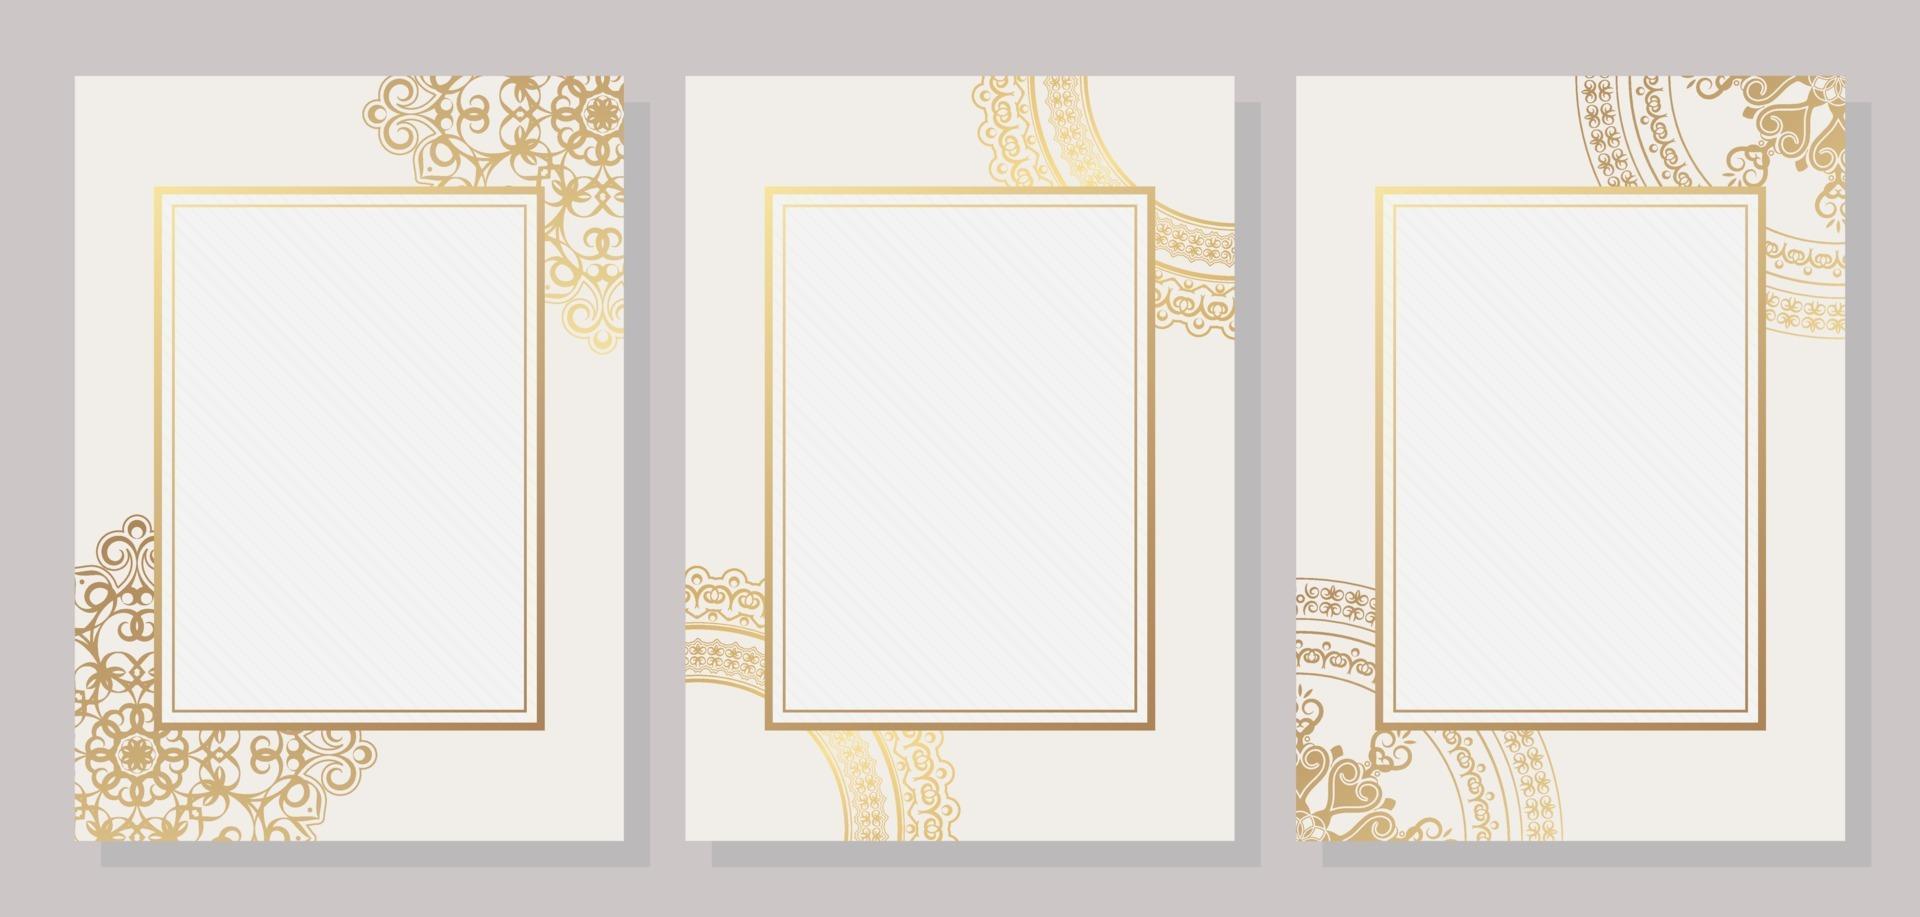 elegant geometrisk flygblad mall text design vektor